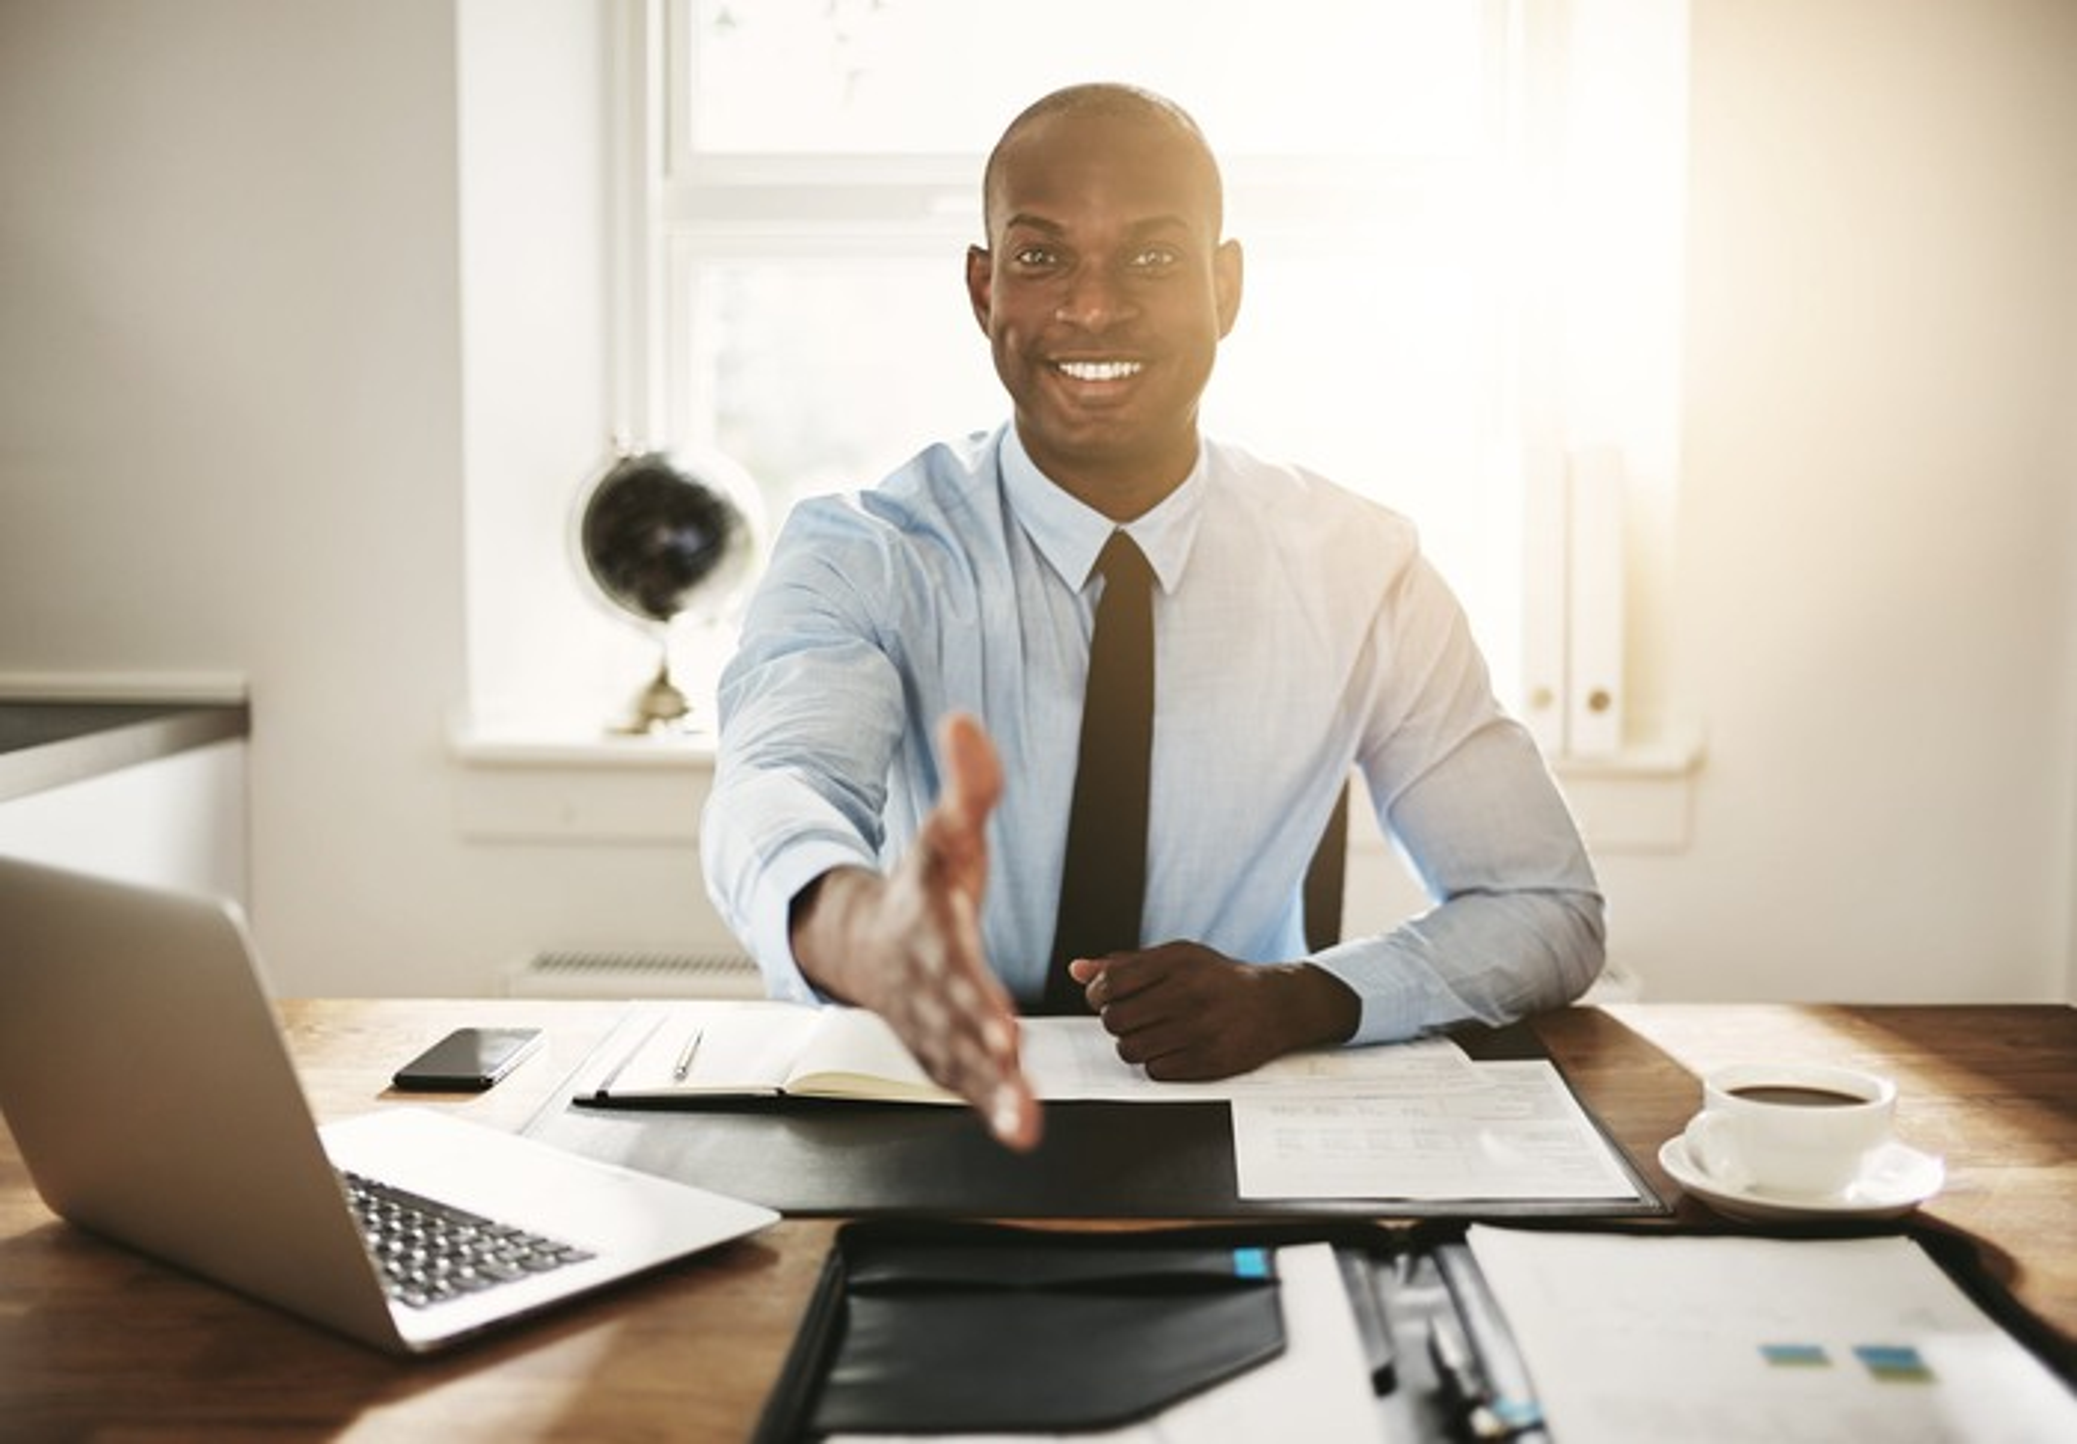 Smiling professional man at desk extending a handshake